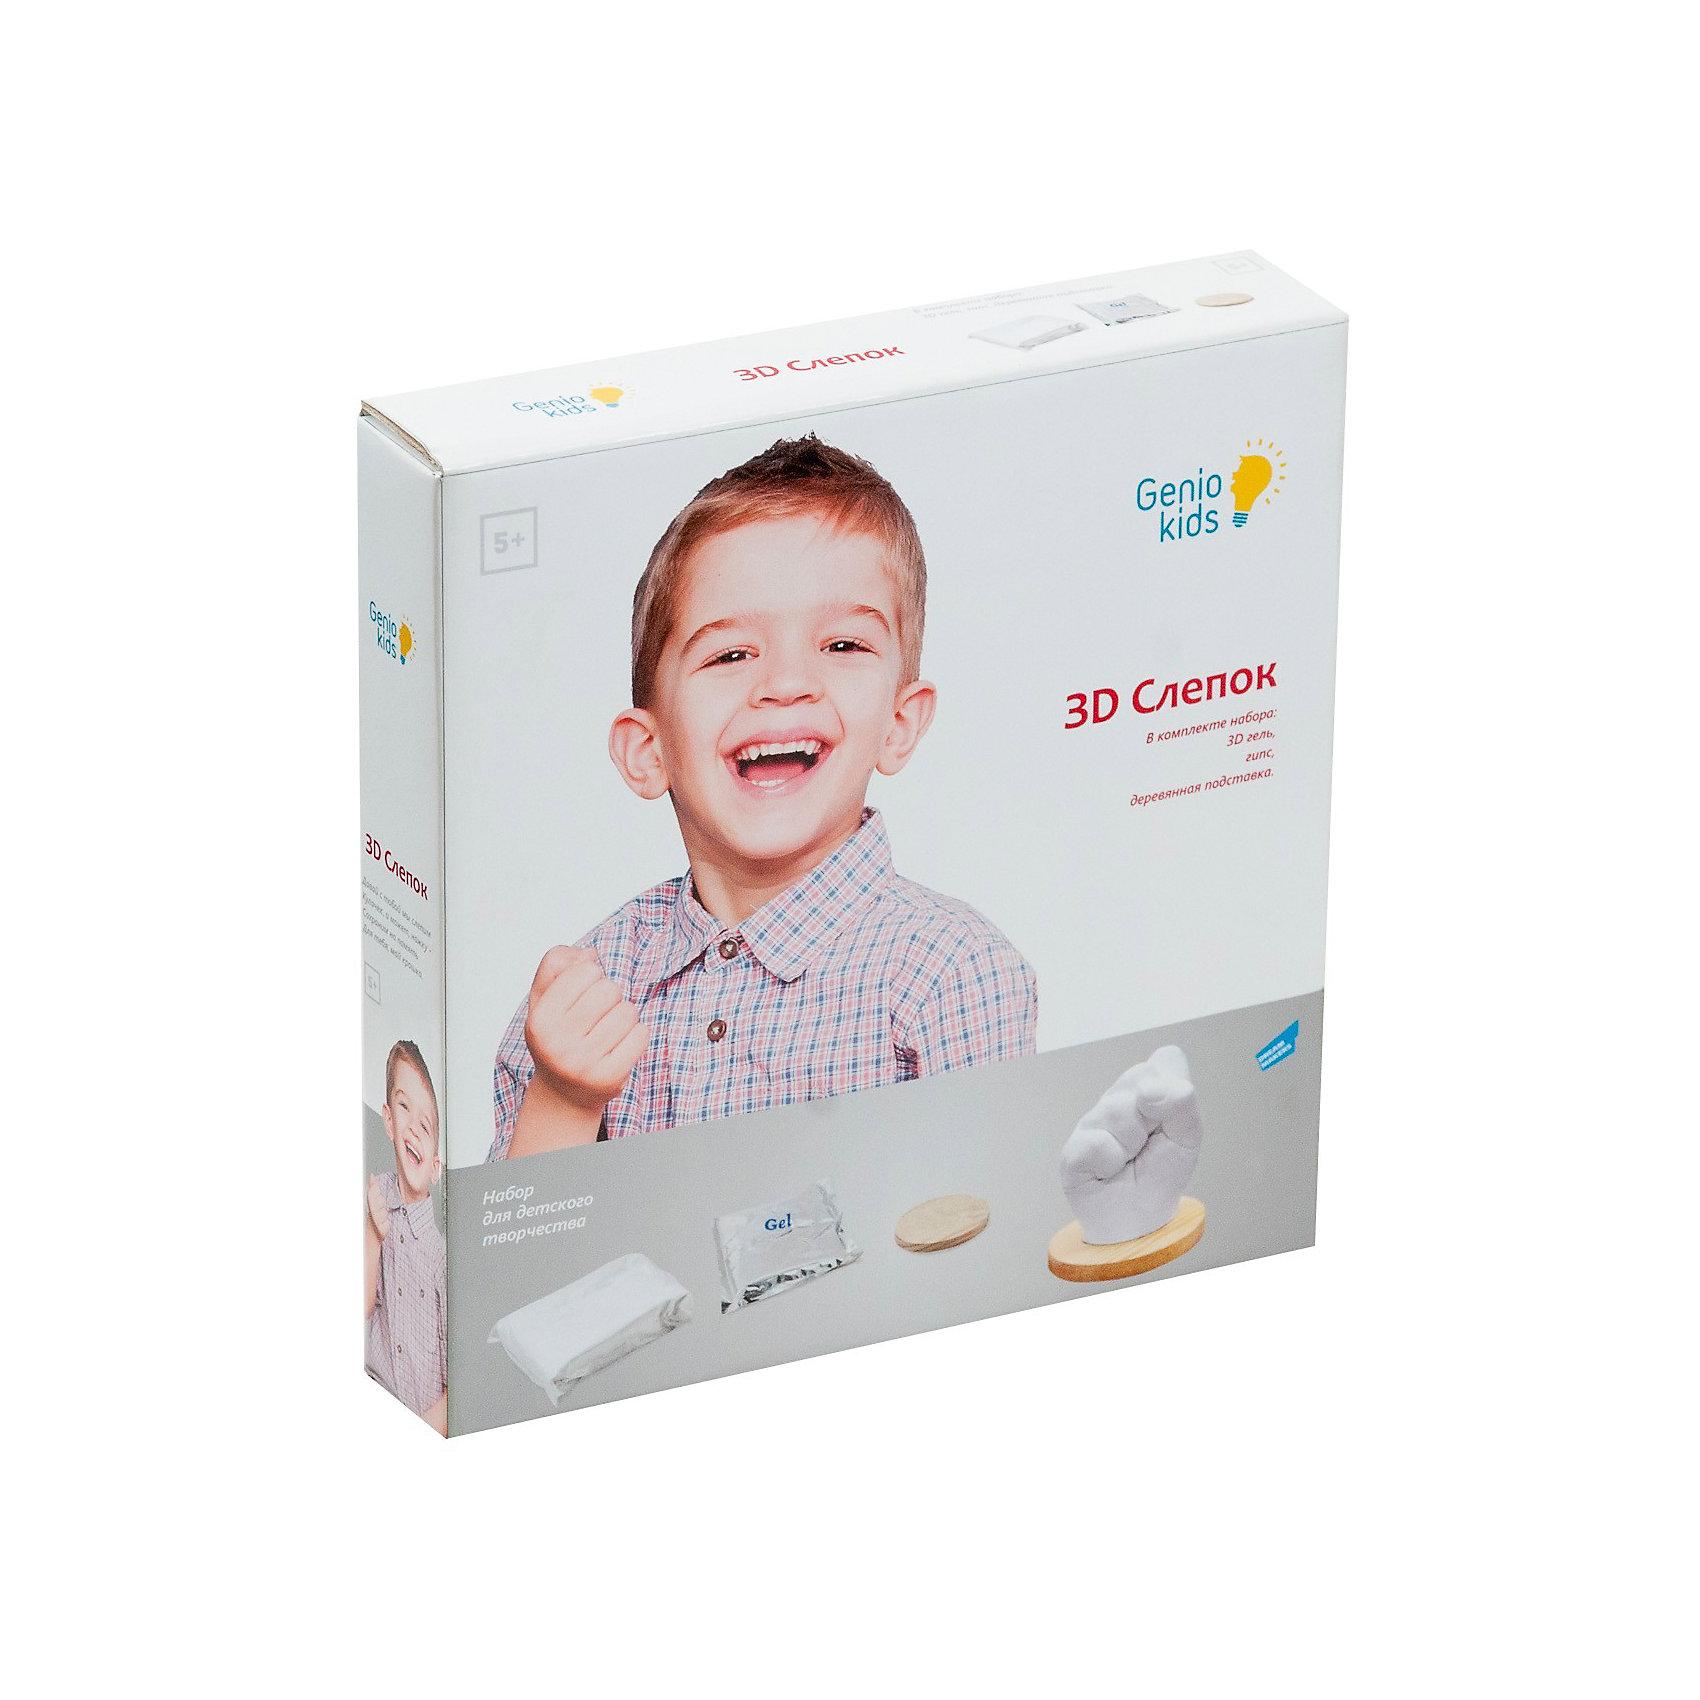 "Genio Kids Набор для детского творчества 3D слепок genio kids набор для детского творчества ""шкатулка"""